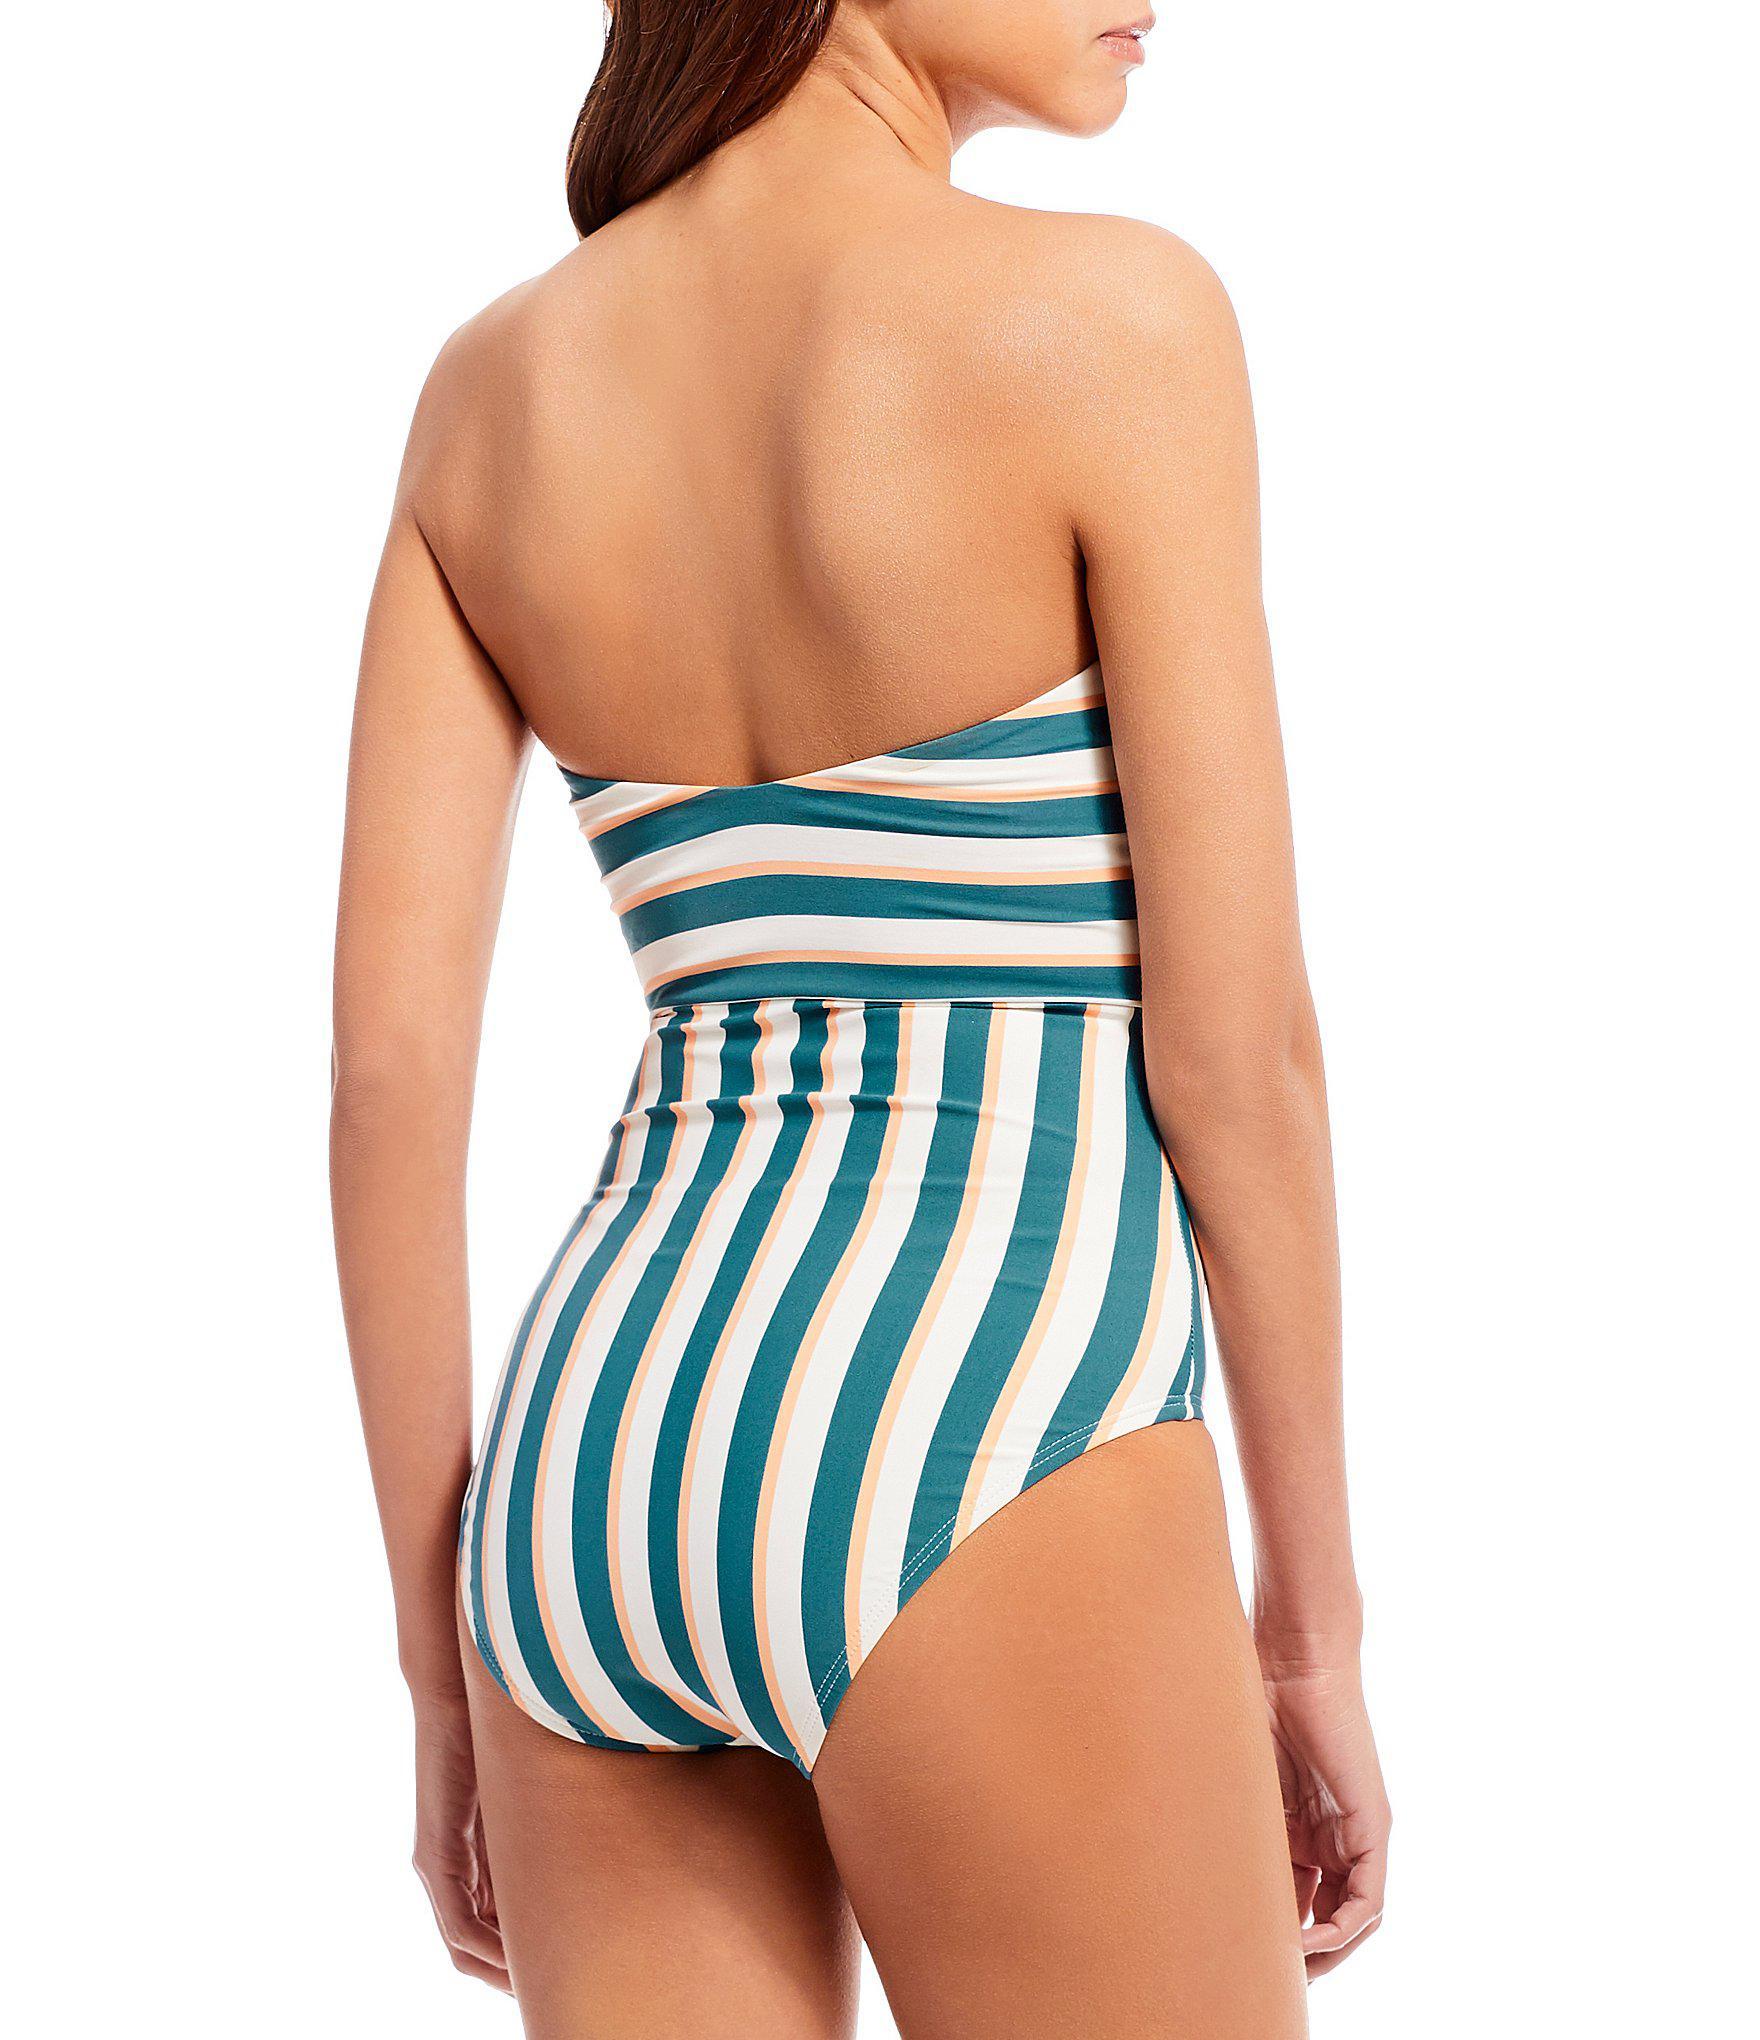 8142ab49ea Gianni Bini Retrophilia Stripe Bandeau Knot One-piece Swimsuit in ...